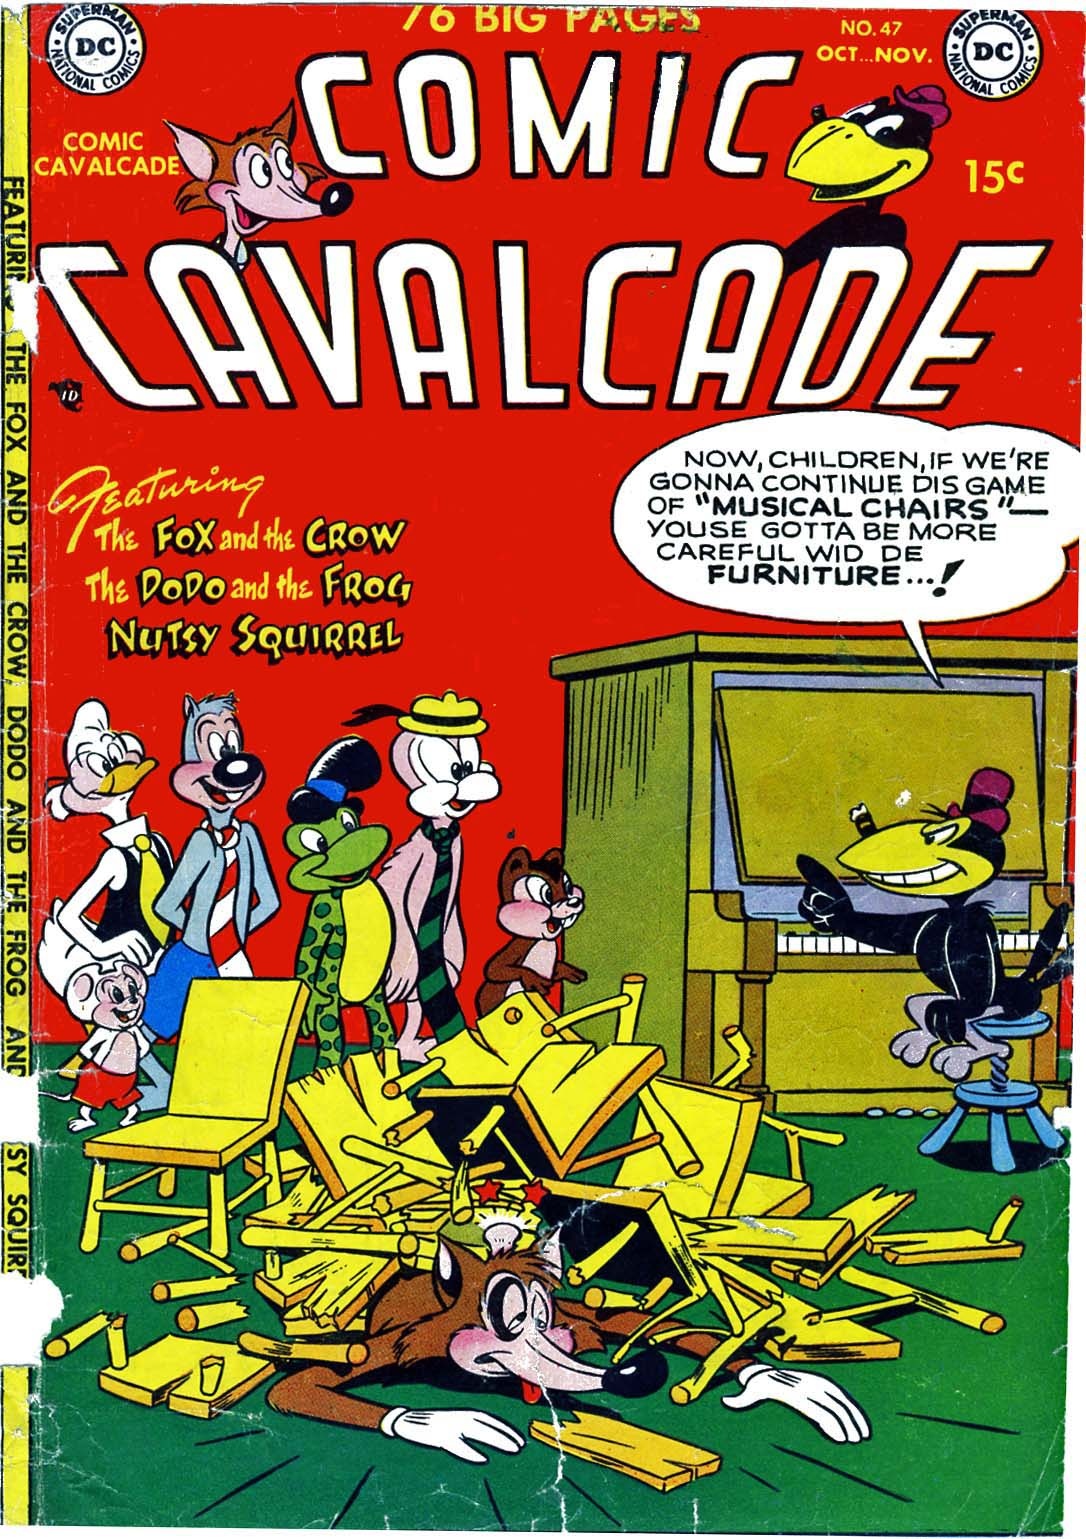 Comic Cavalcade issue 47 - Page 1